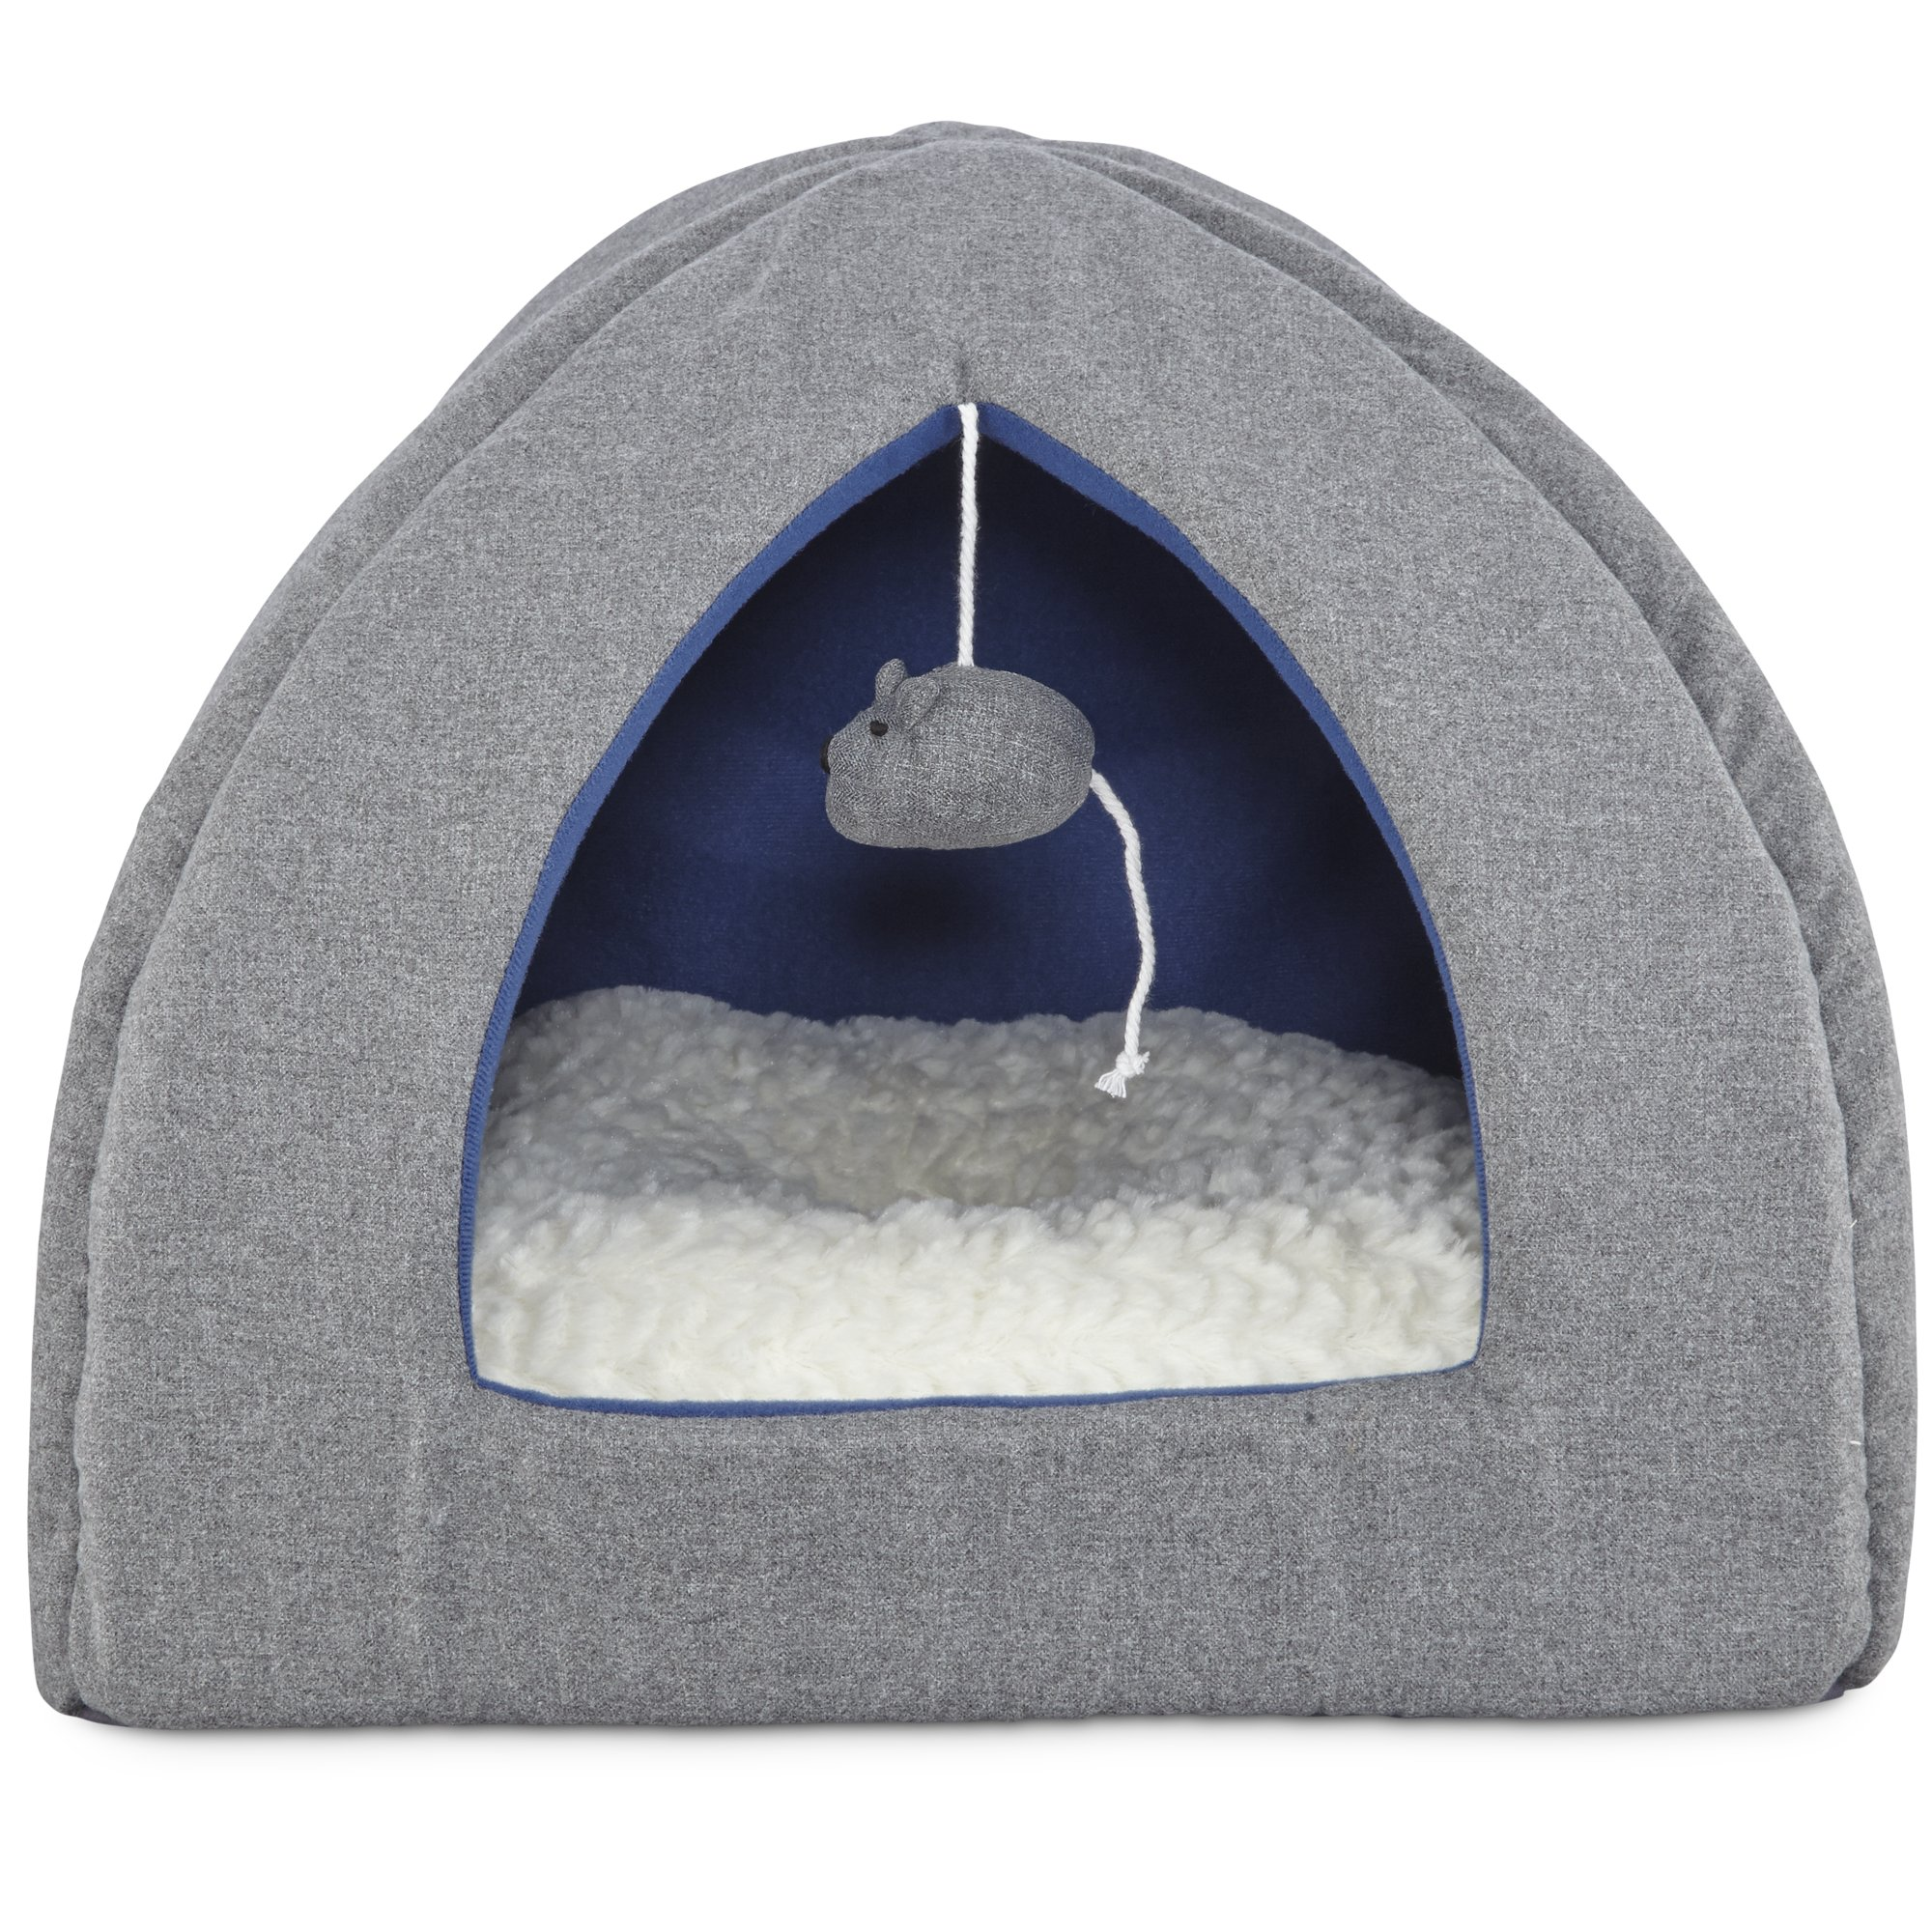 Harmony Hooded Igloo Cat Bed In Grey Petco